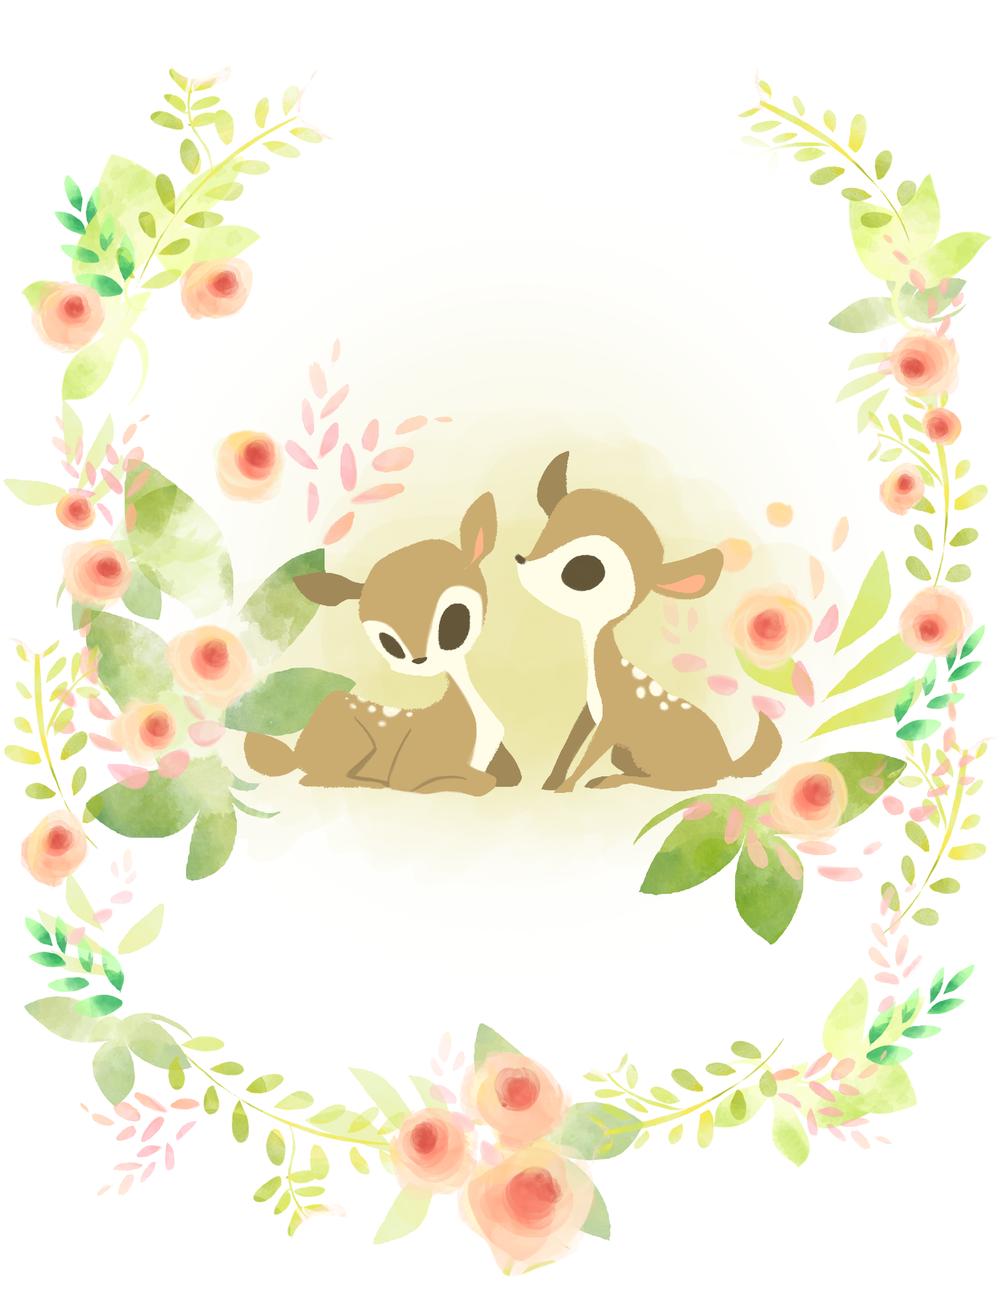 A couple of deer